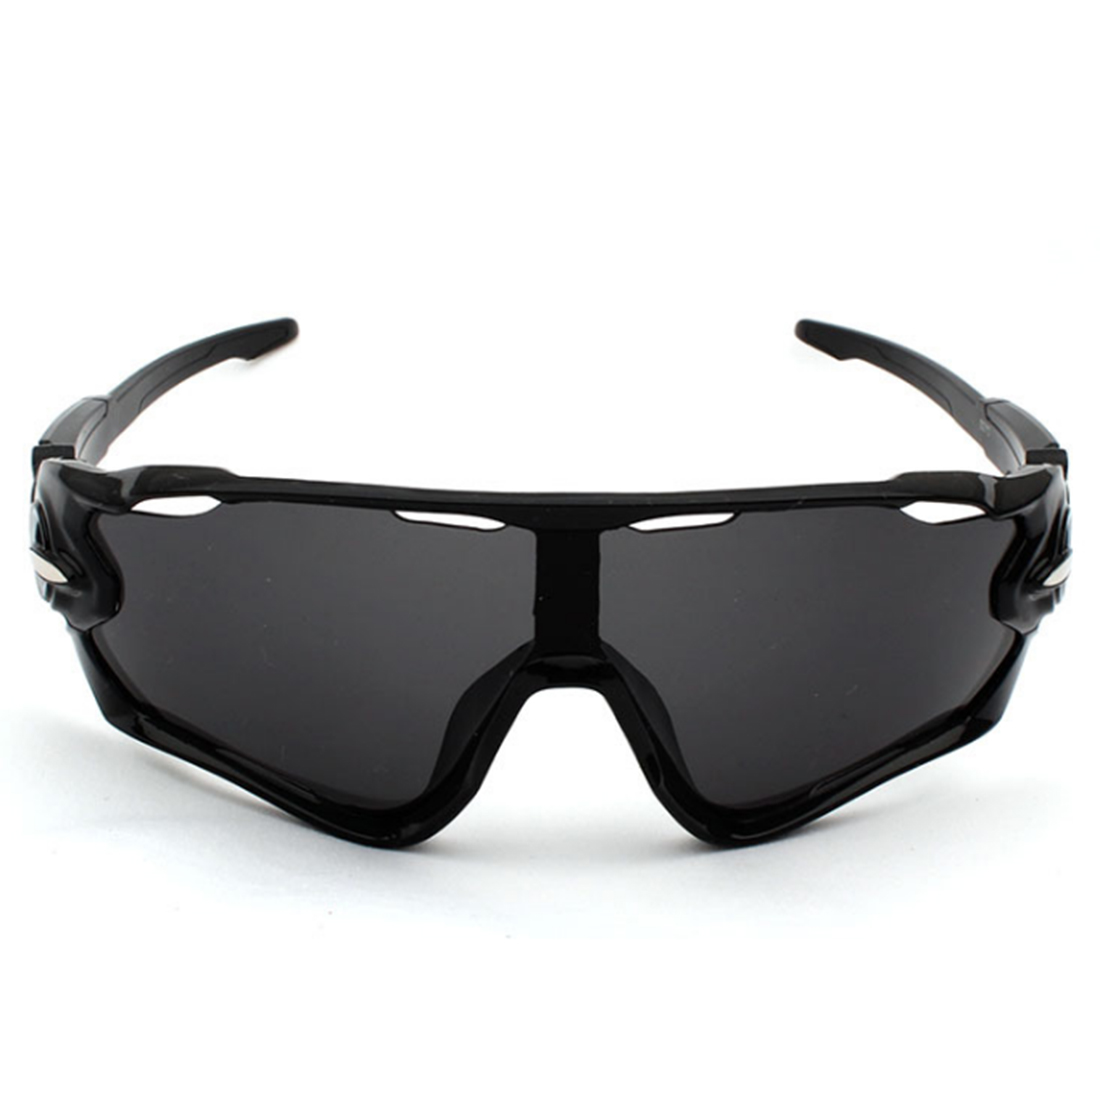 Fishing Eyewear Outdoor Activities Fishing Sunglasses Goggle Skiing Cycling Wind Goggle Polarized Glasses